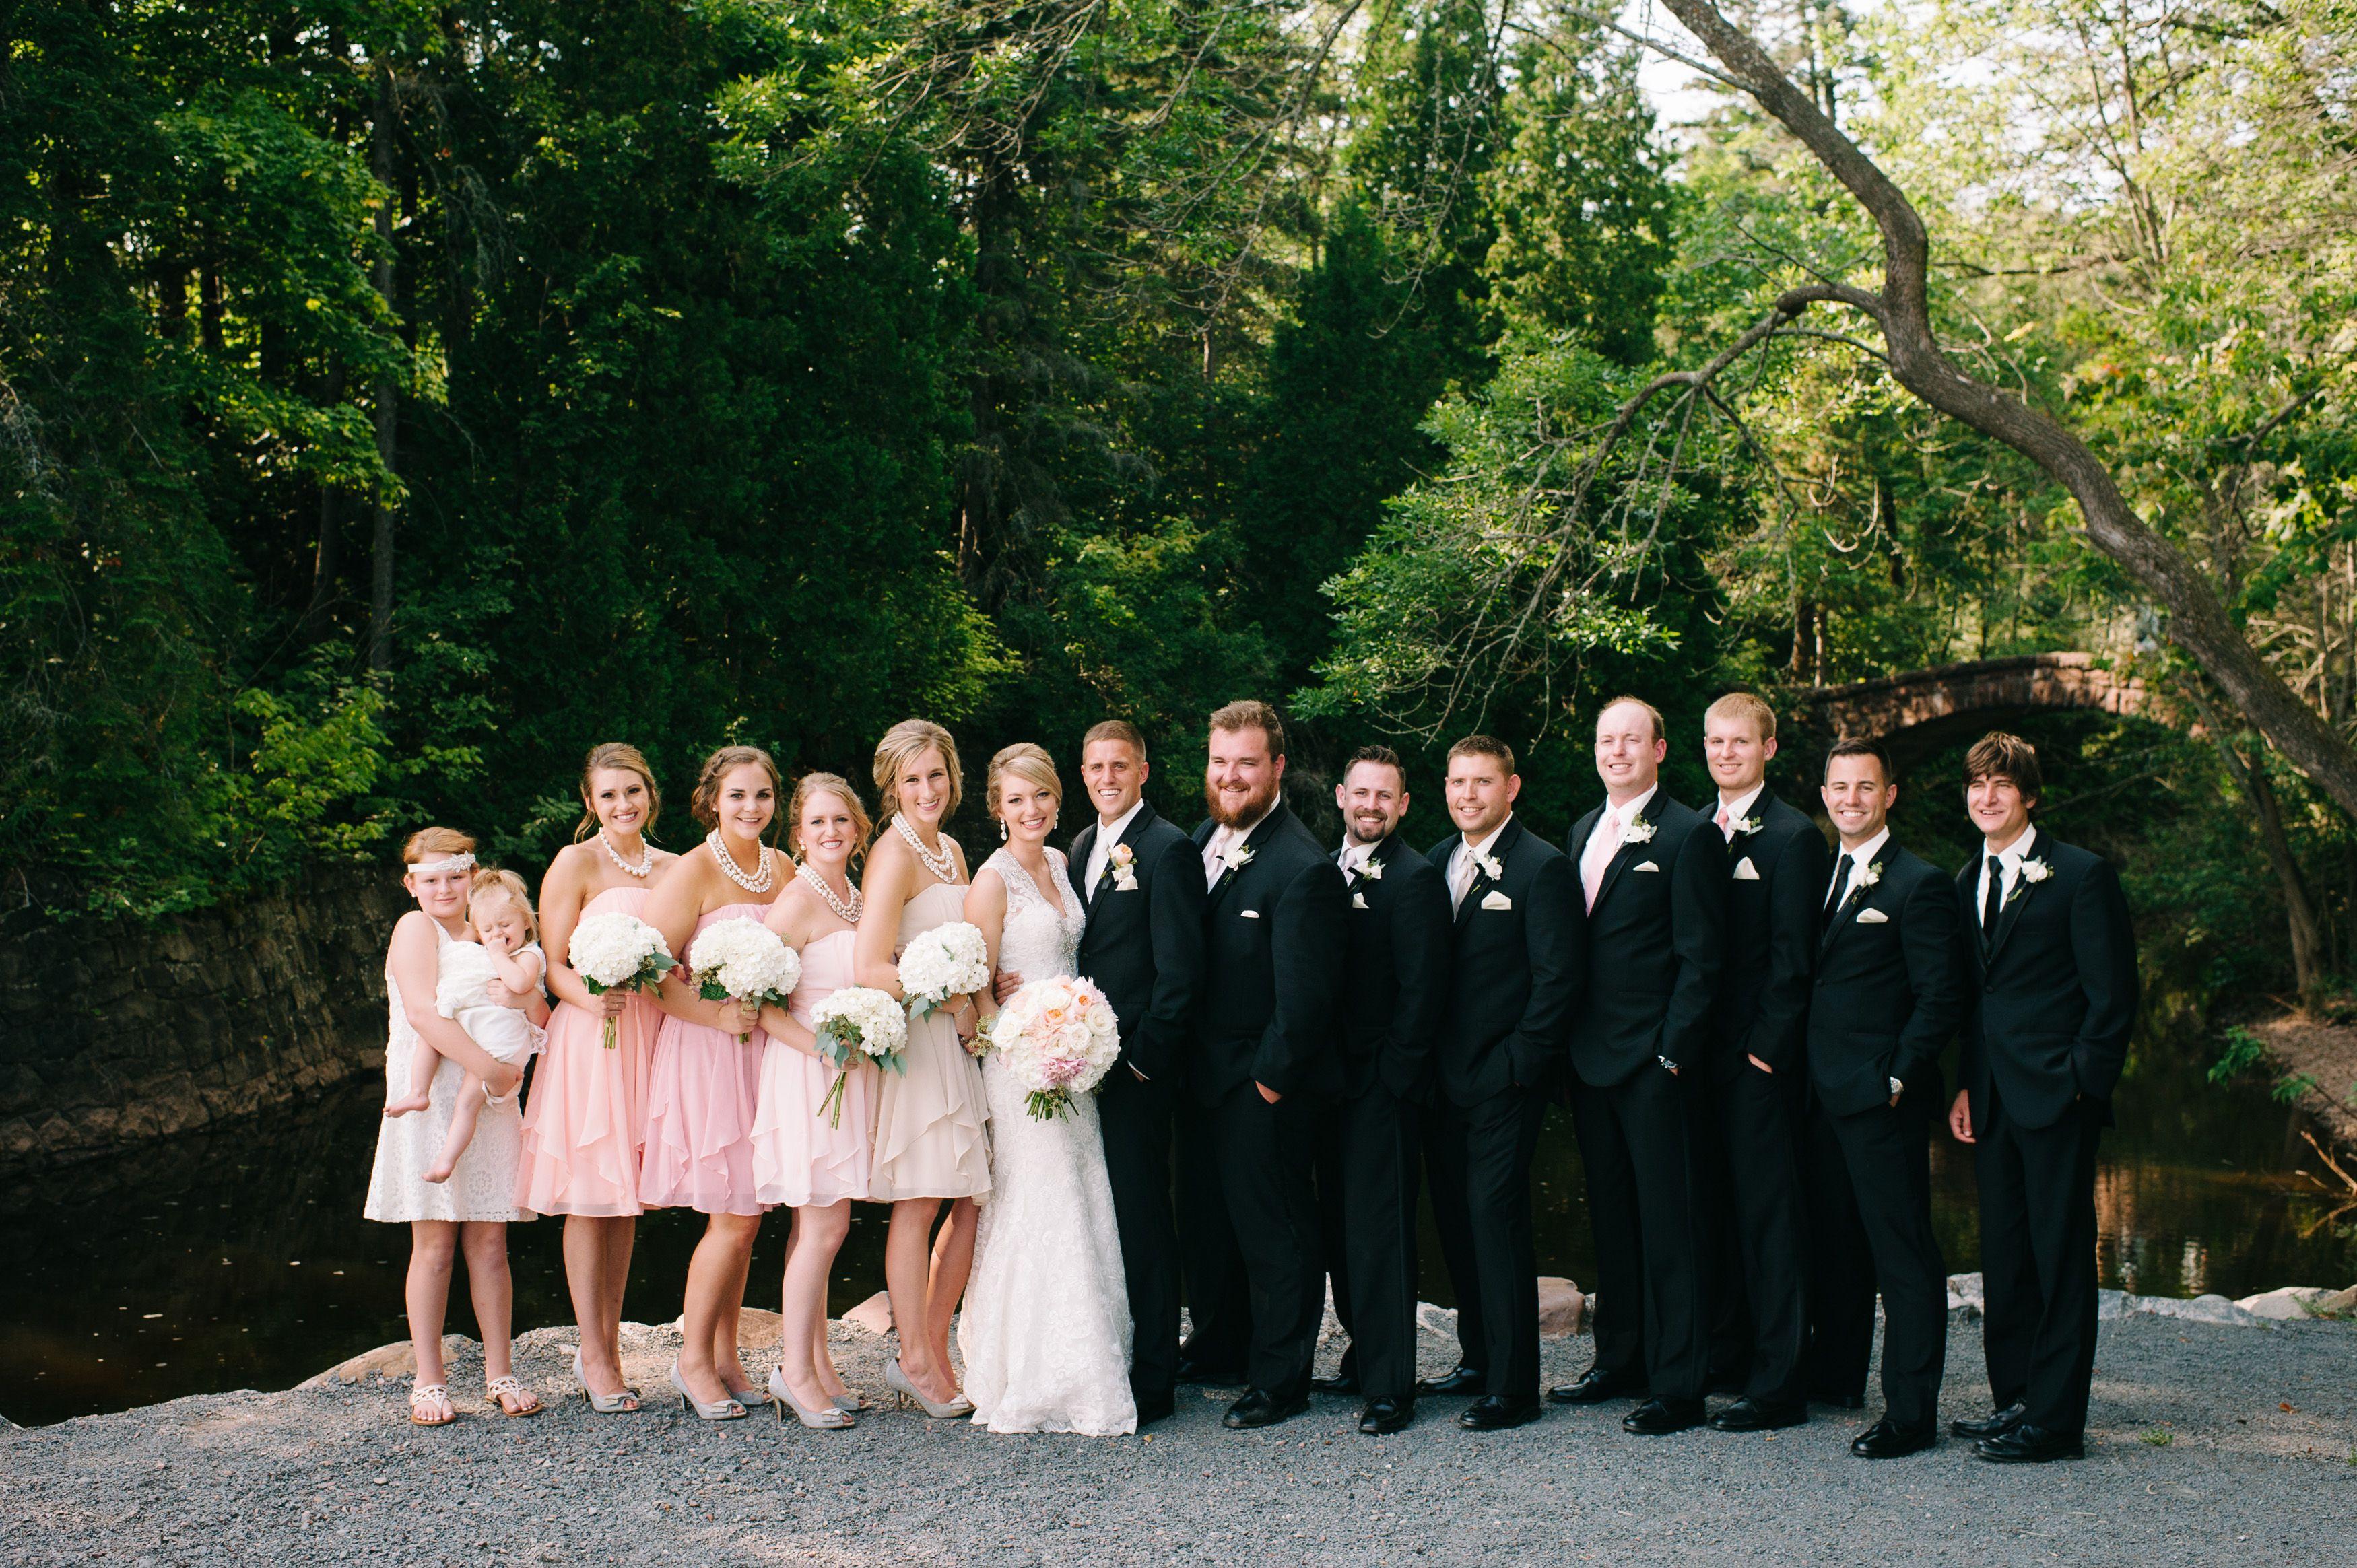 Glensheen Mansion Duluth Mn In 2020 Glensheen Mansion Glensheen Wedding Dresses